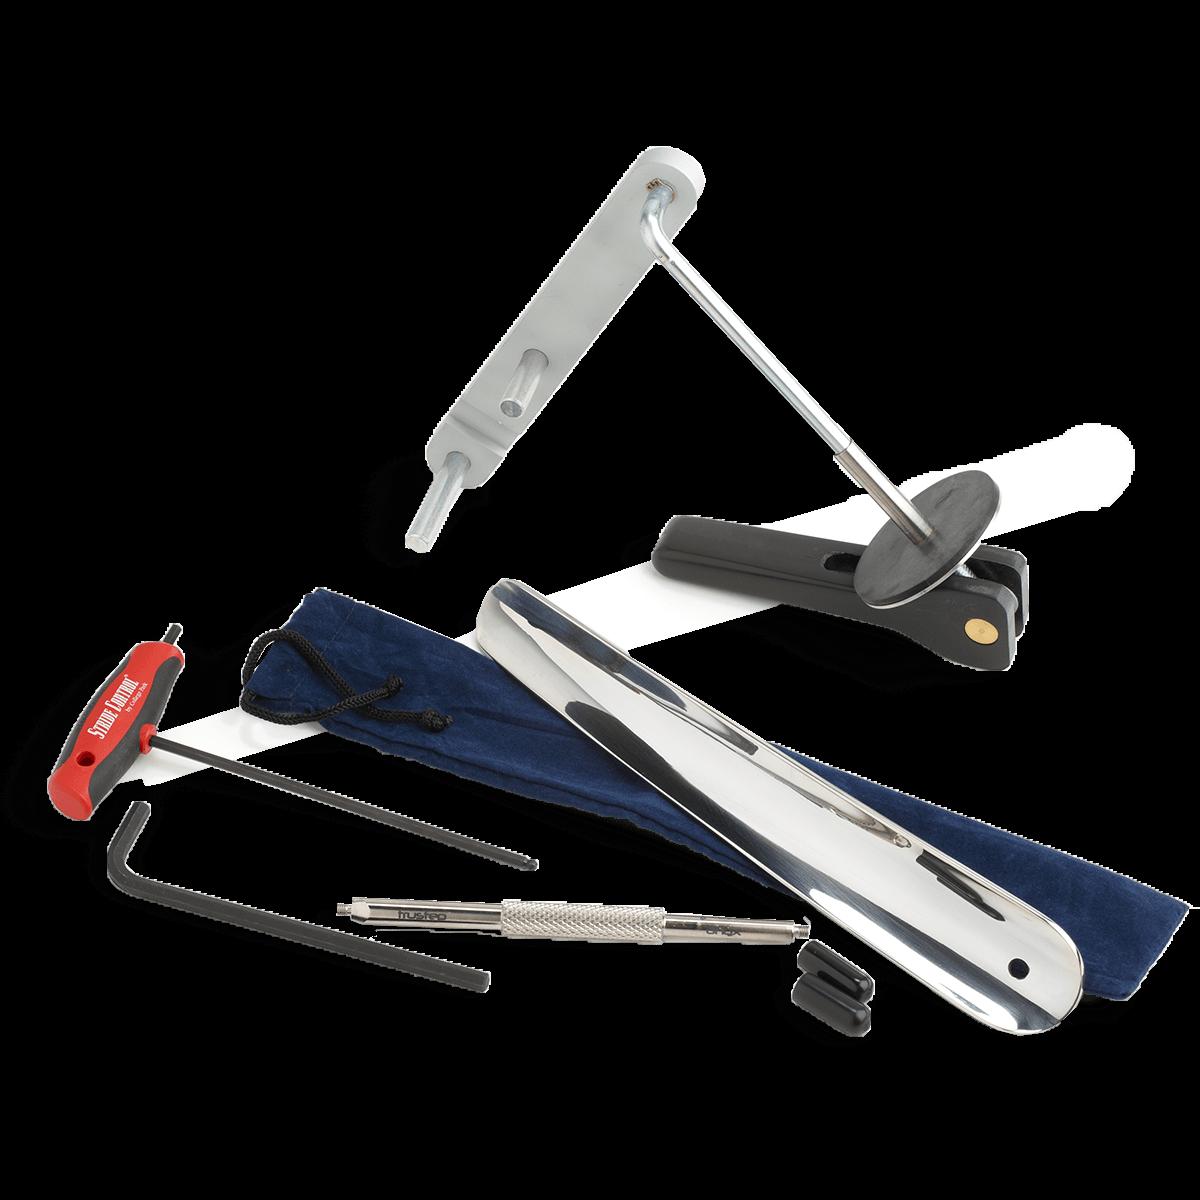 trustep-tool-large